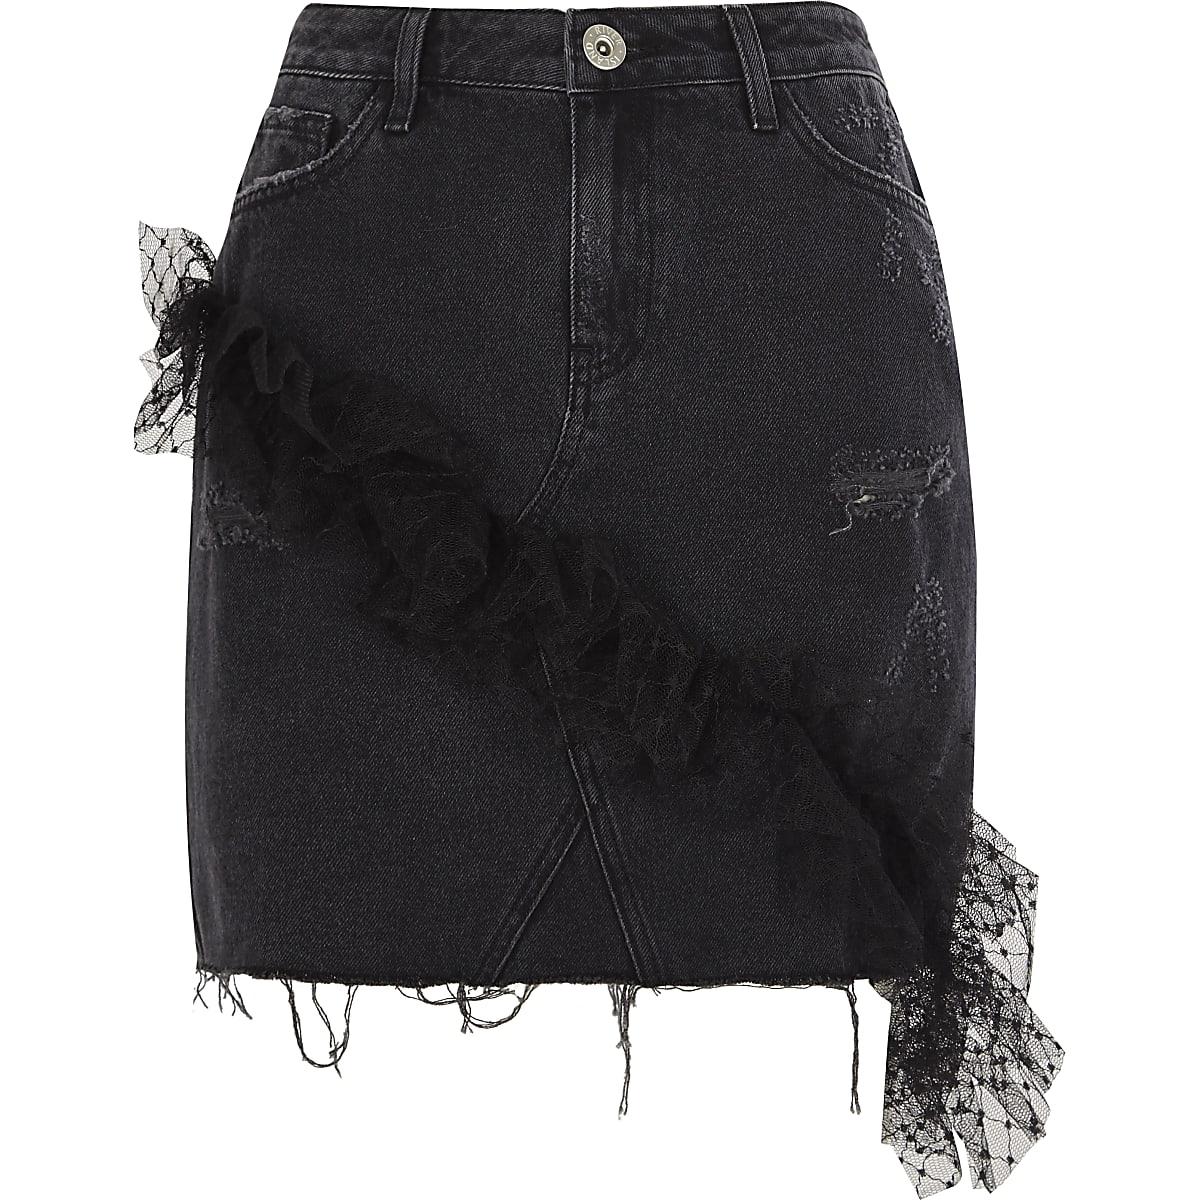 Black mesh frill denim mini skirt